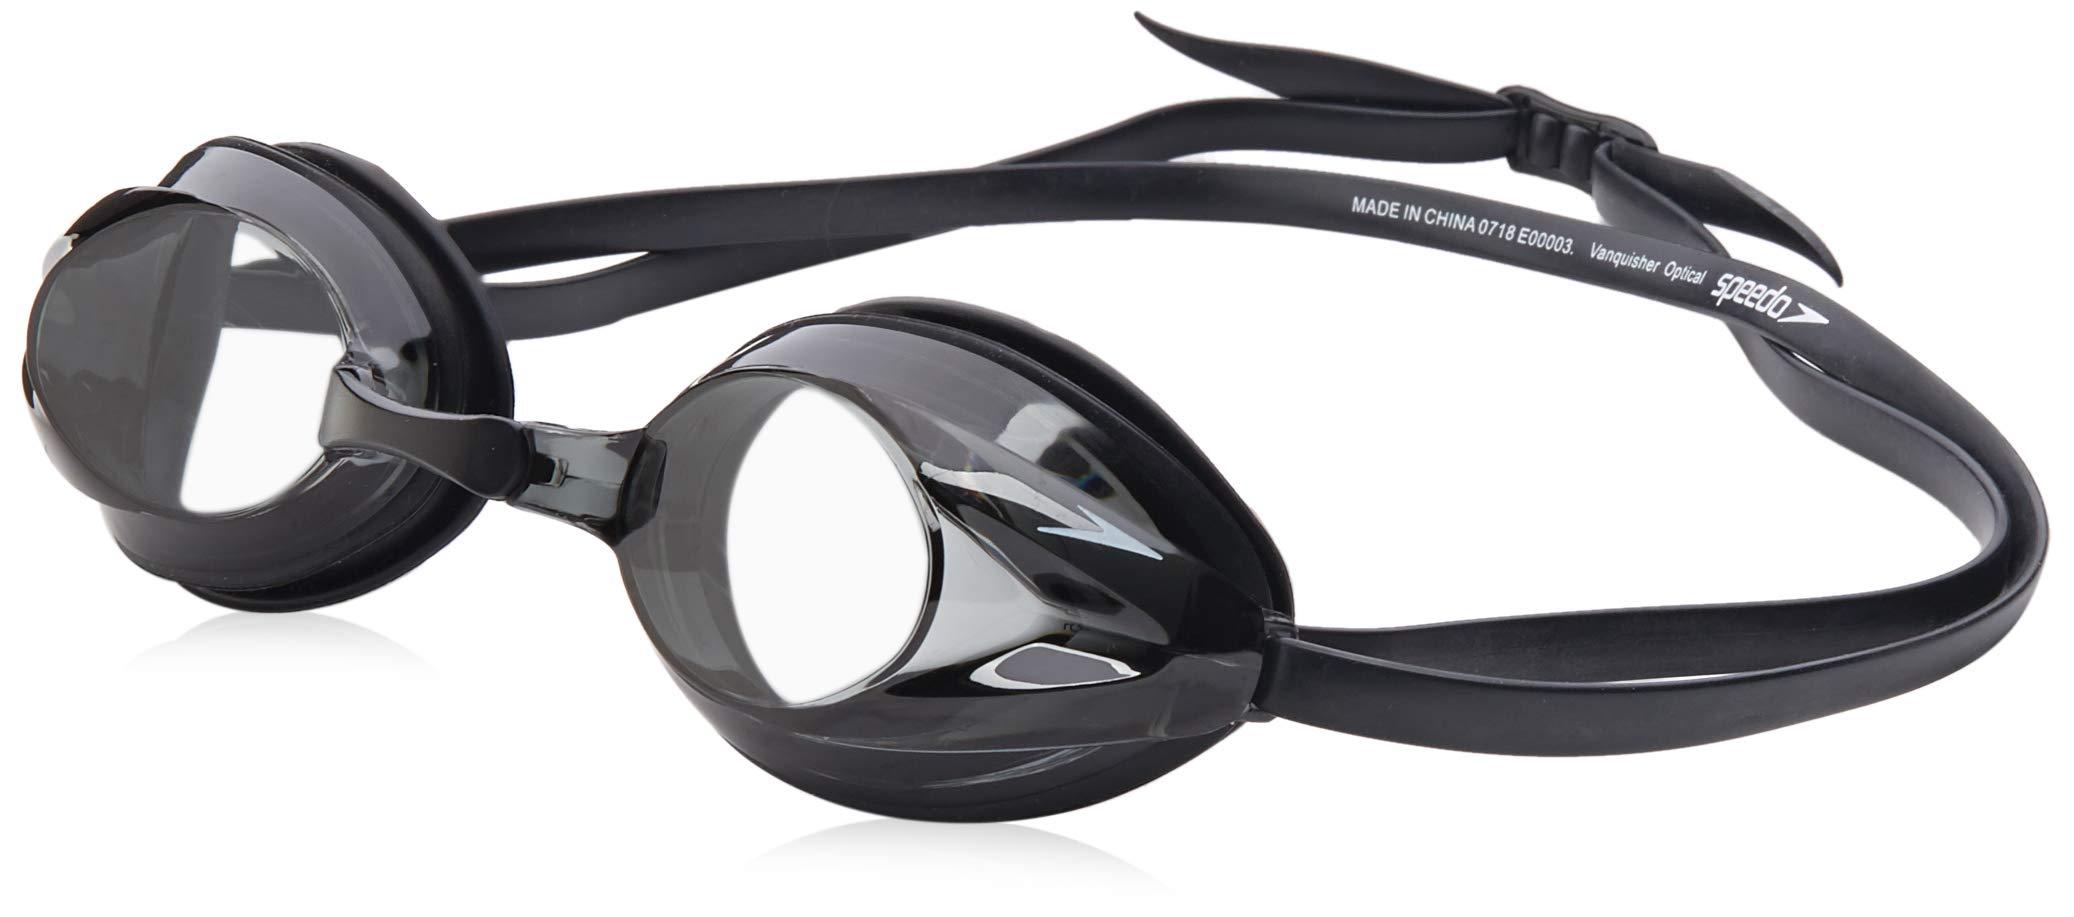 Speedo Vanquisher Optical Swim Goggle, Grey, -1.5